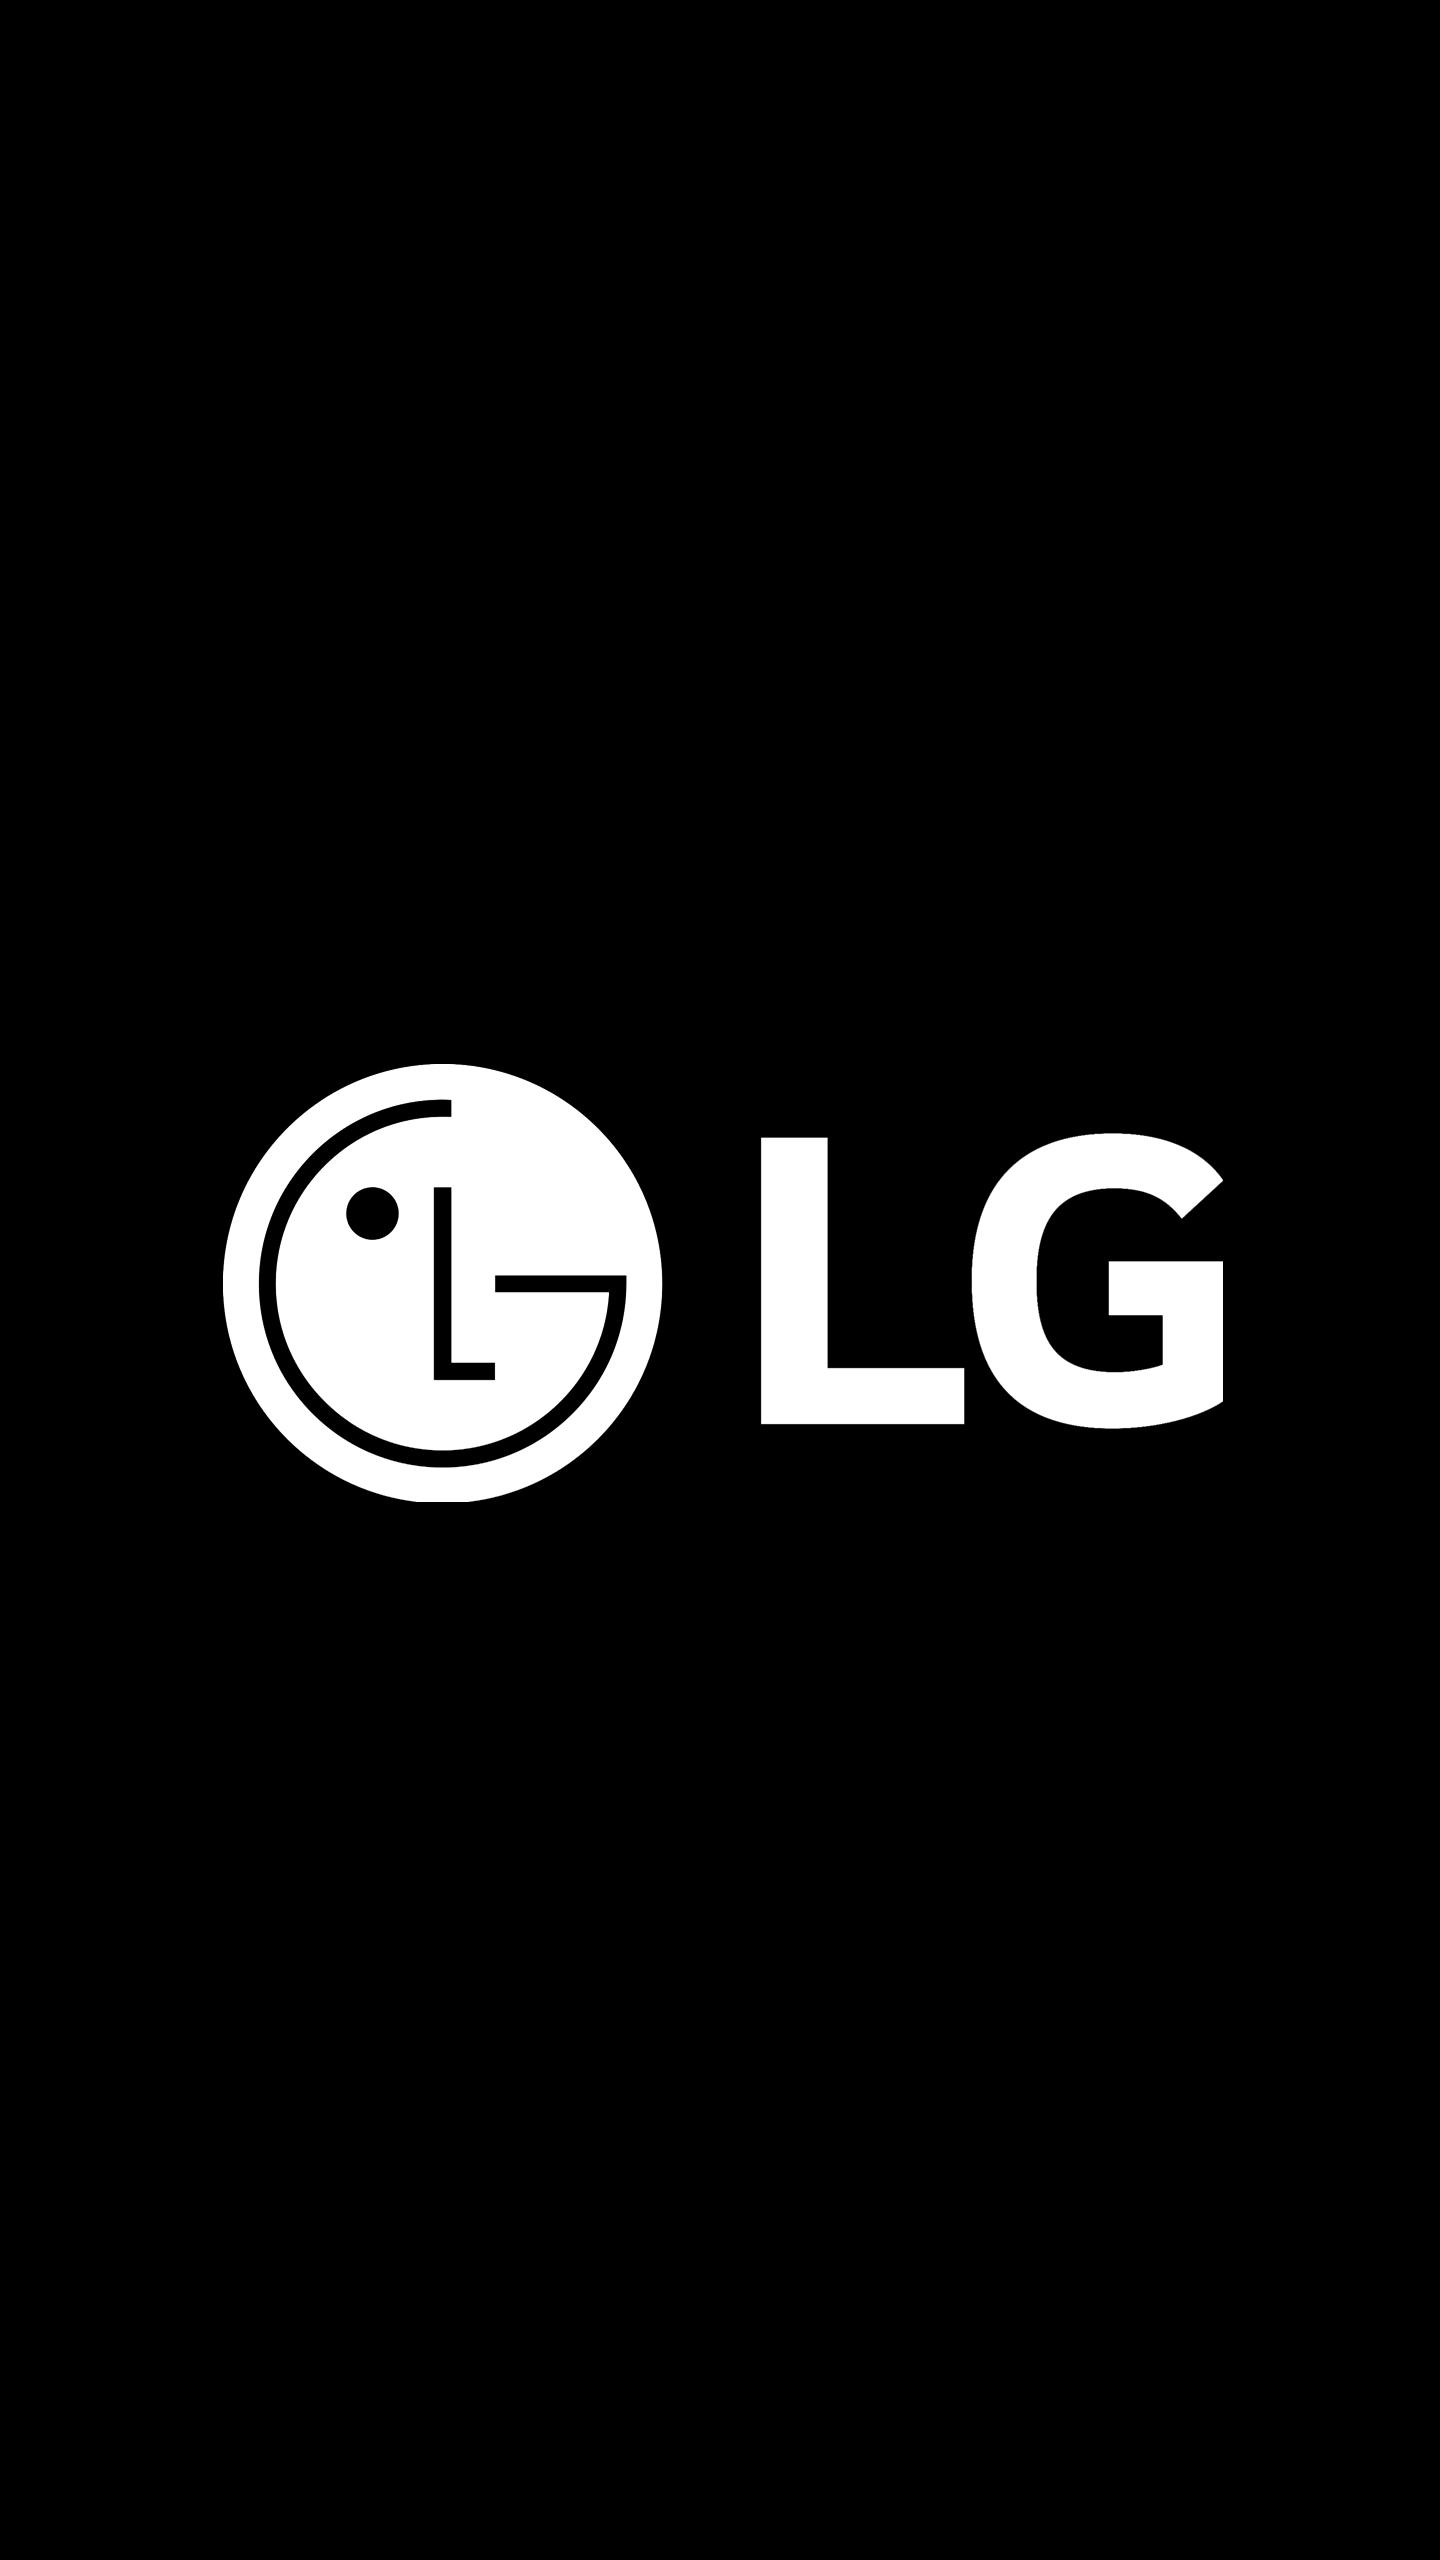 LG 1440p/2K OLED Wallpaper Papeis de parede, Samsung